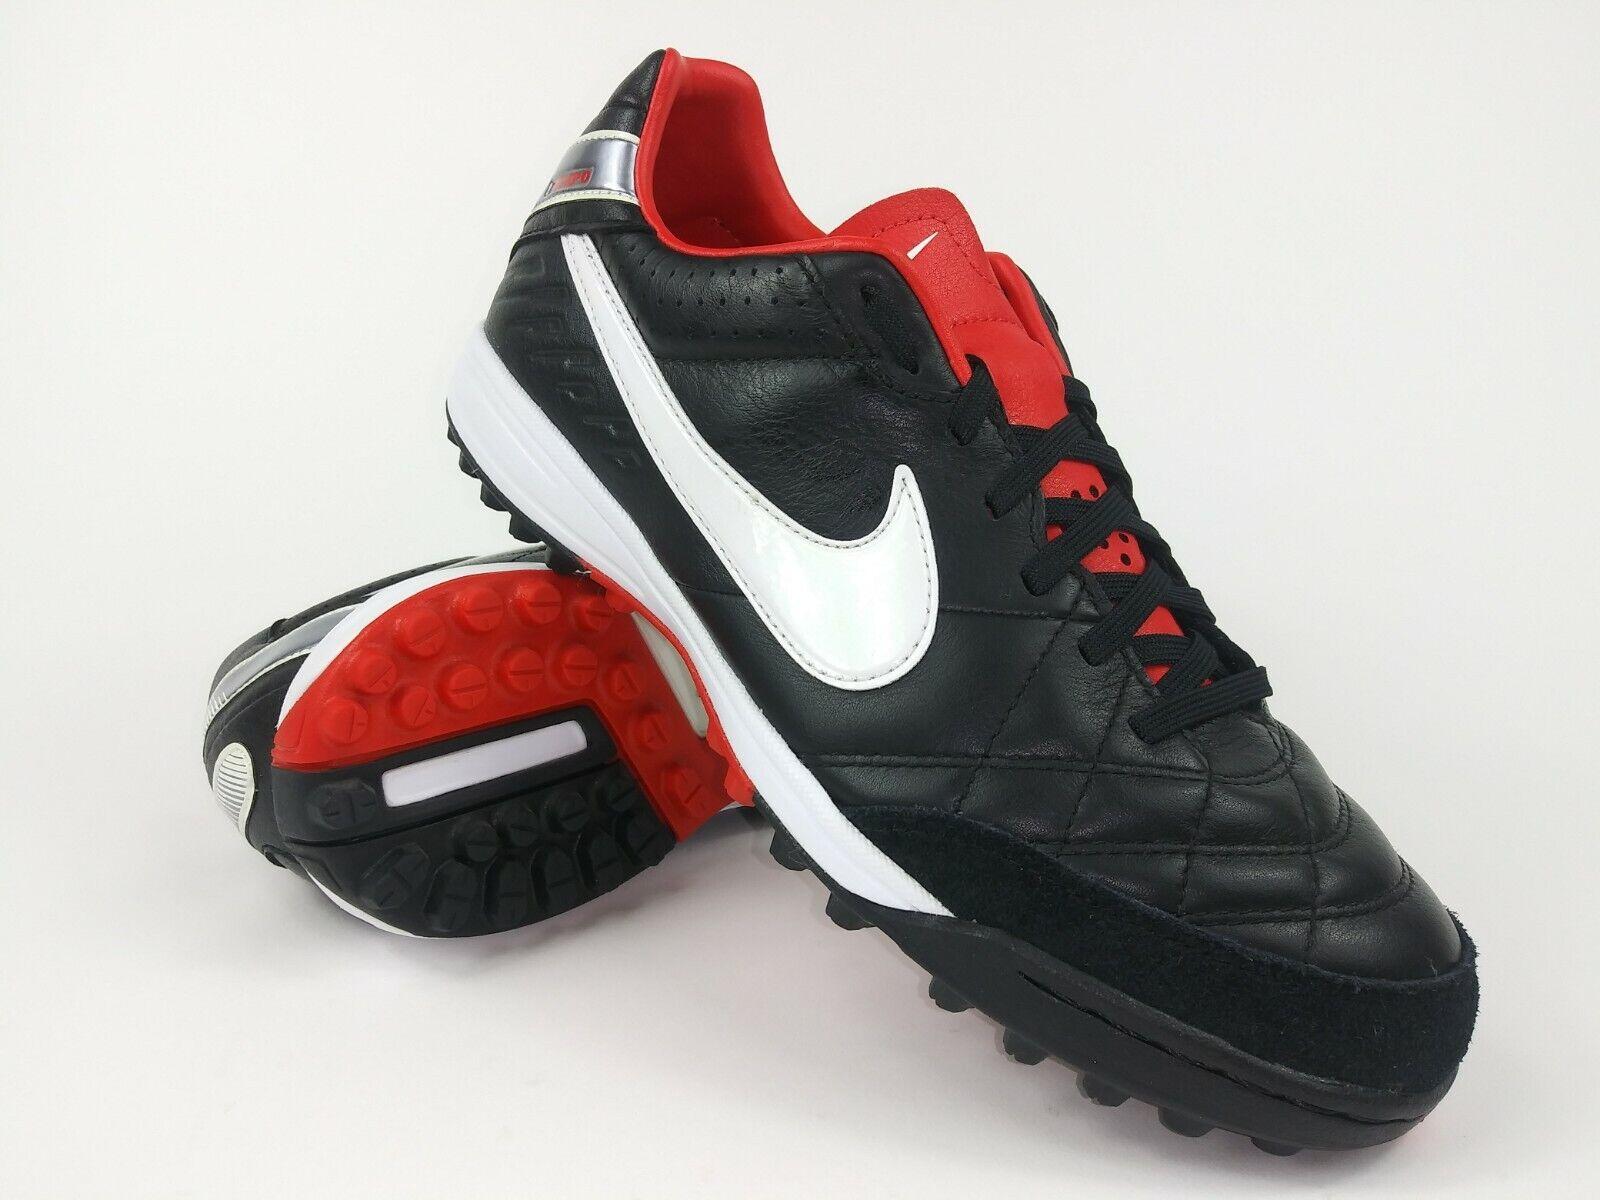 Nike Hombre Raro Tiempo Mystic IV Roscada Horquilla 454314-010 Negro Rojo botines botas talla 7.5